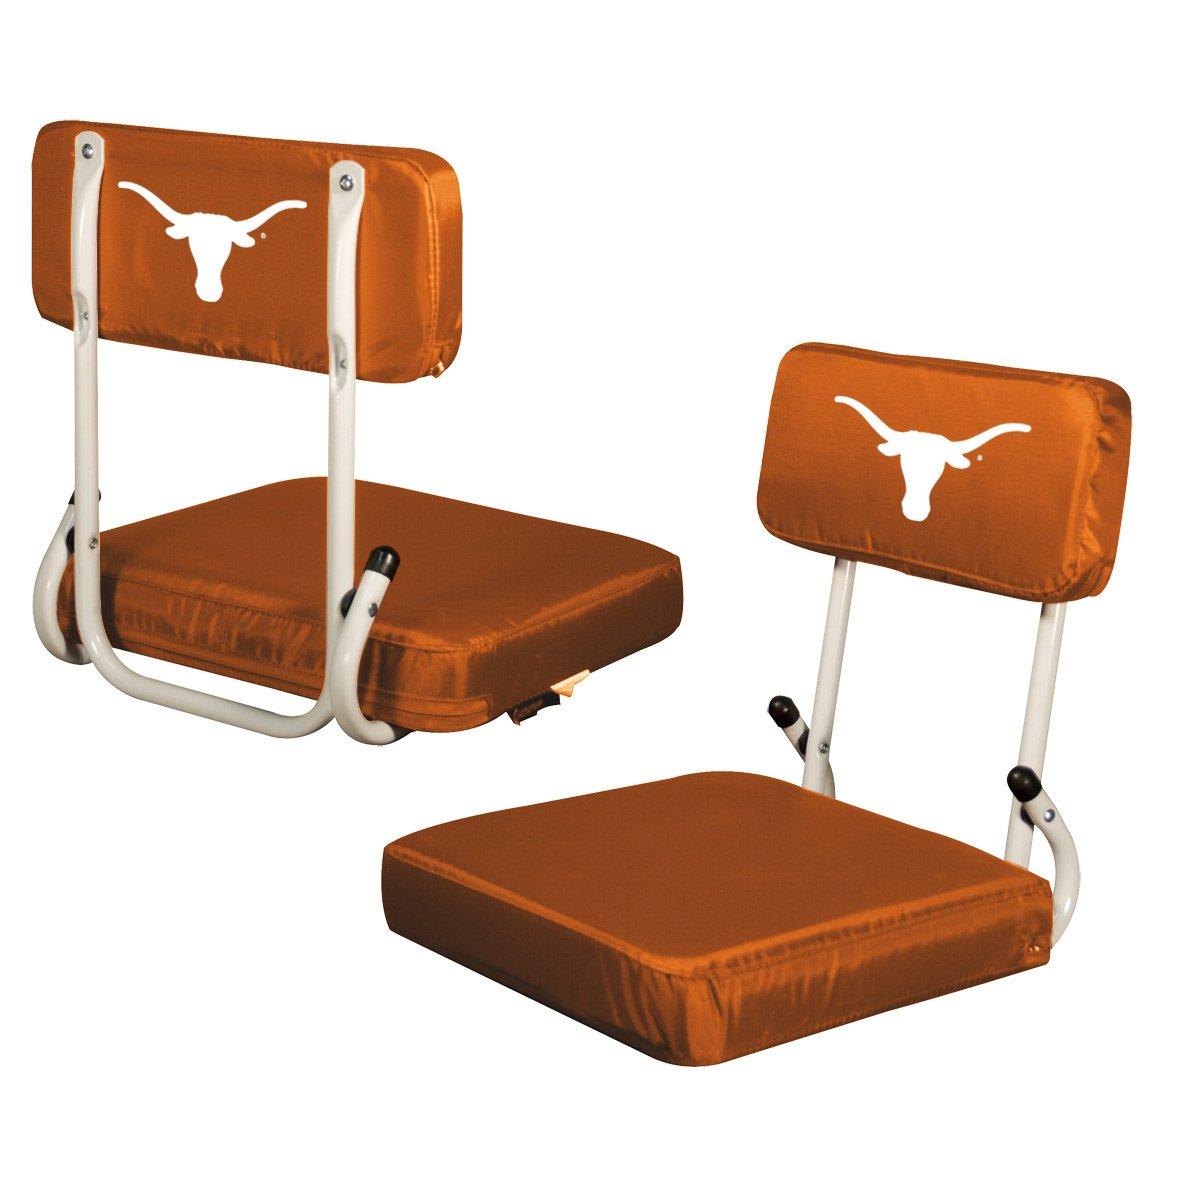 Texas Hard Back SS #WednesdayWisdom https://www.shareasale.com/m-pr.cfm?merchantID=23631&userID=916198&productID=651759000&afftrack=newtexans_twitter…